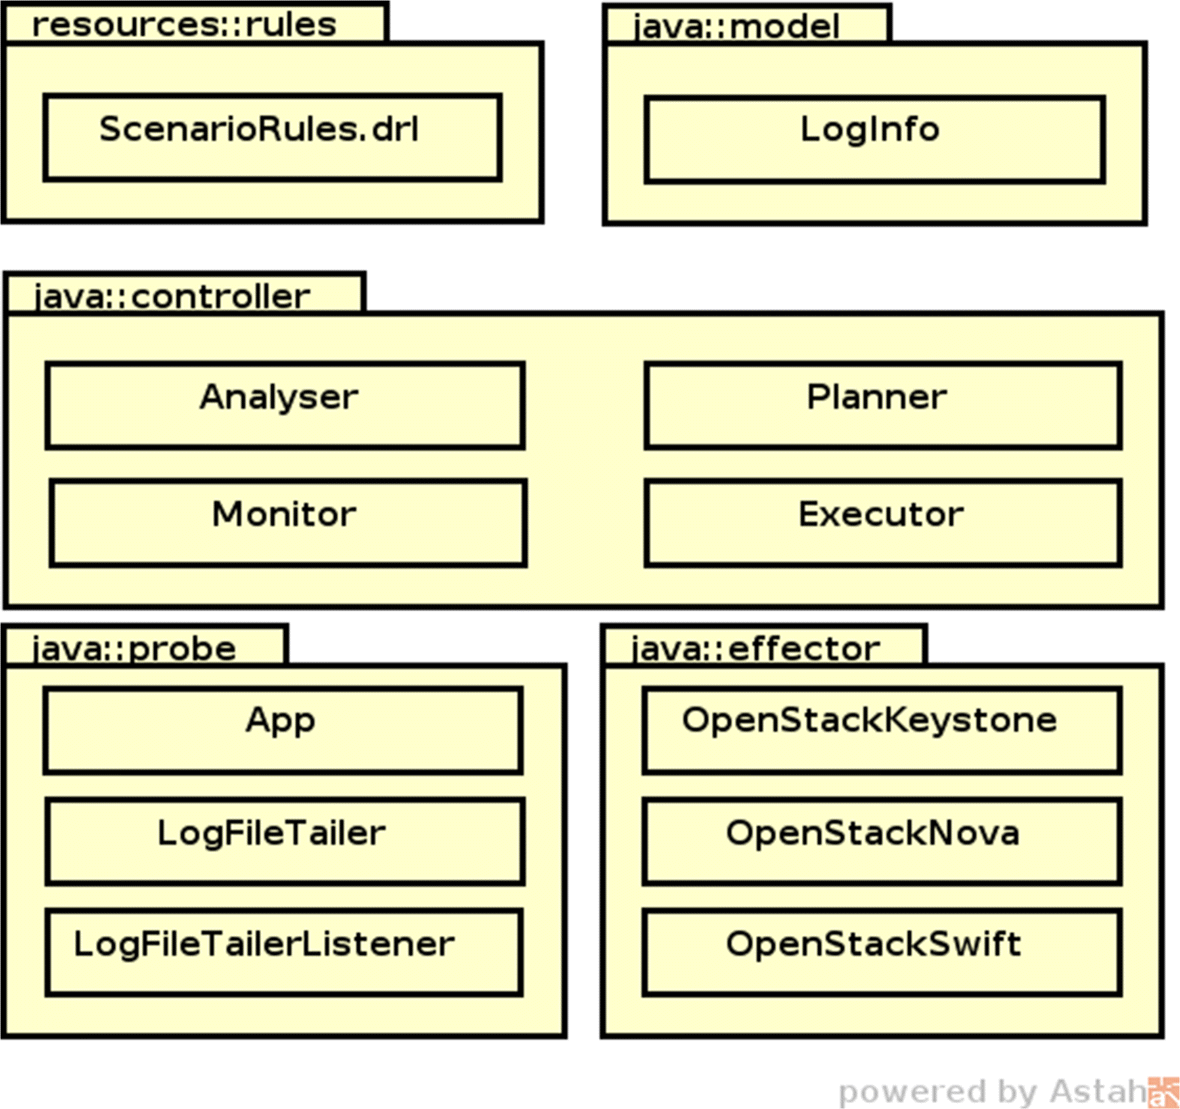 Self-adaptive authorisation in OpenStack cloud platform | SpringerLink